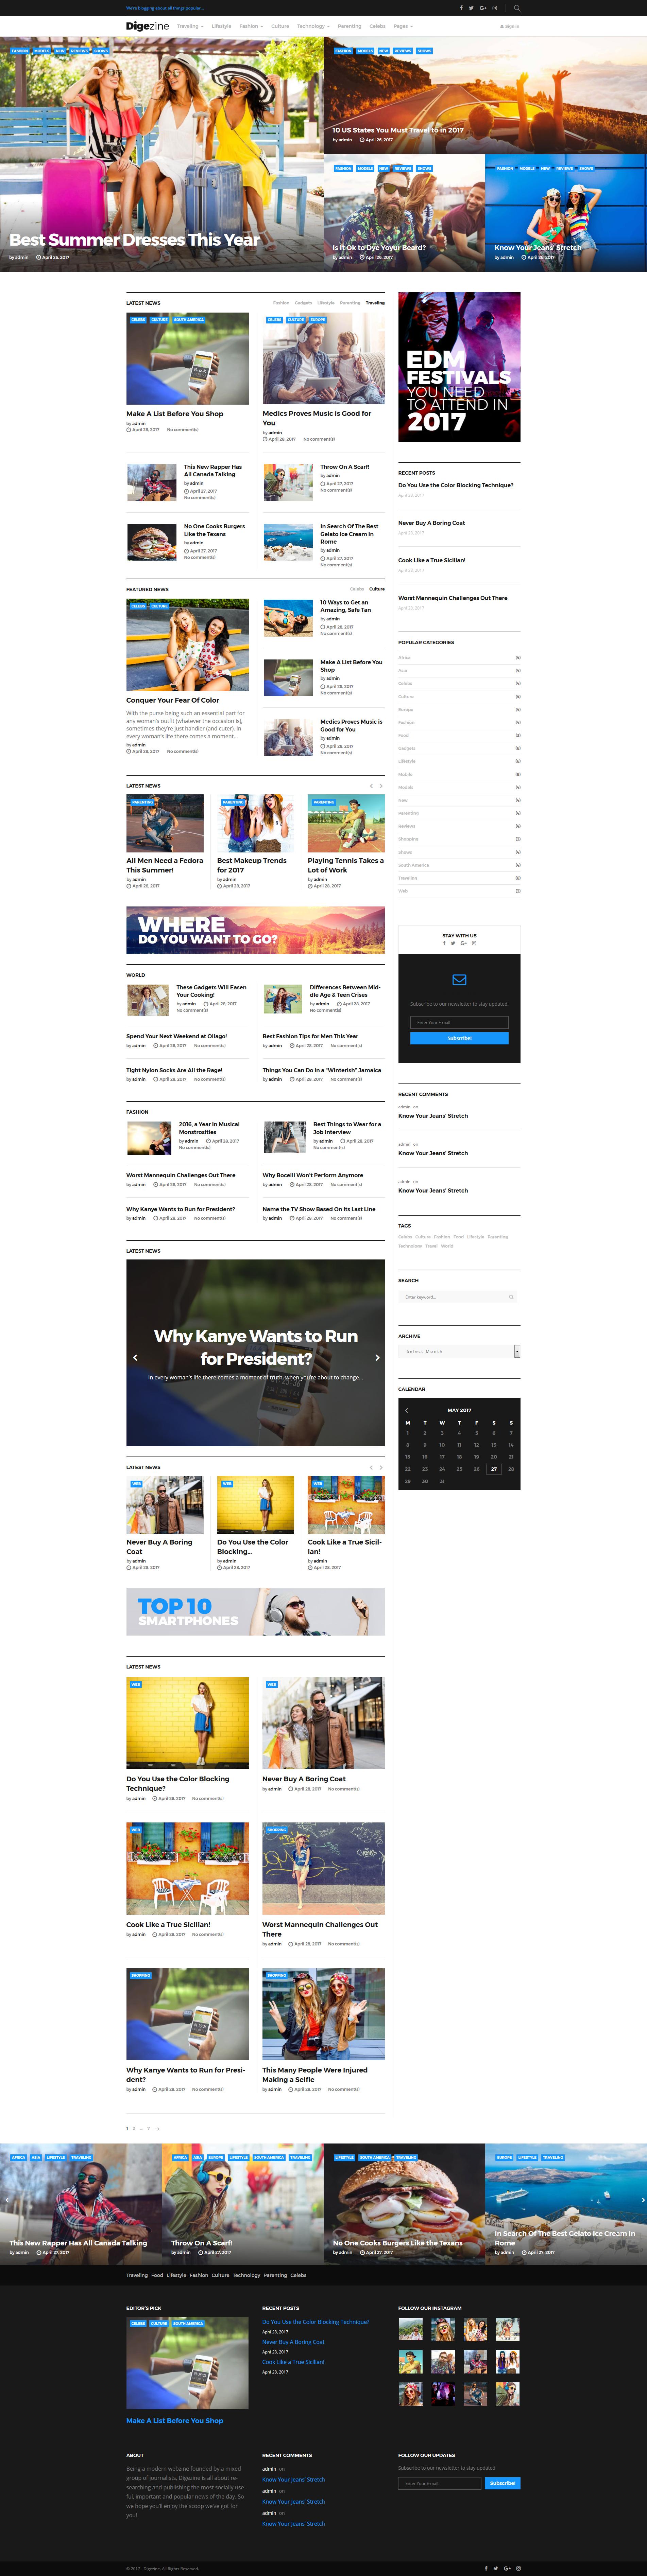 Großzügig Wordpress Website Vorlagen Fotos - Entry Level Resume ...